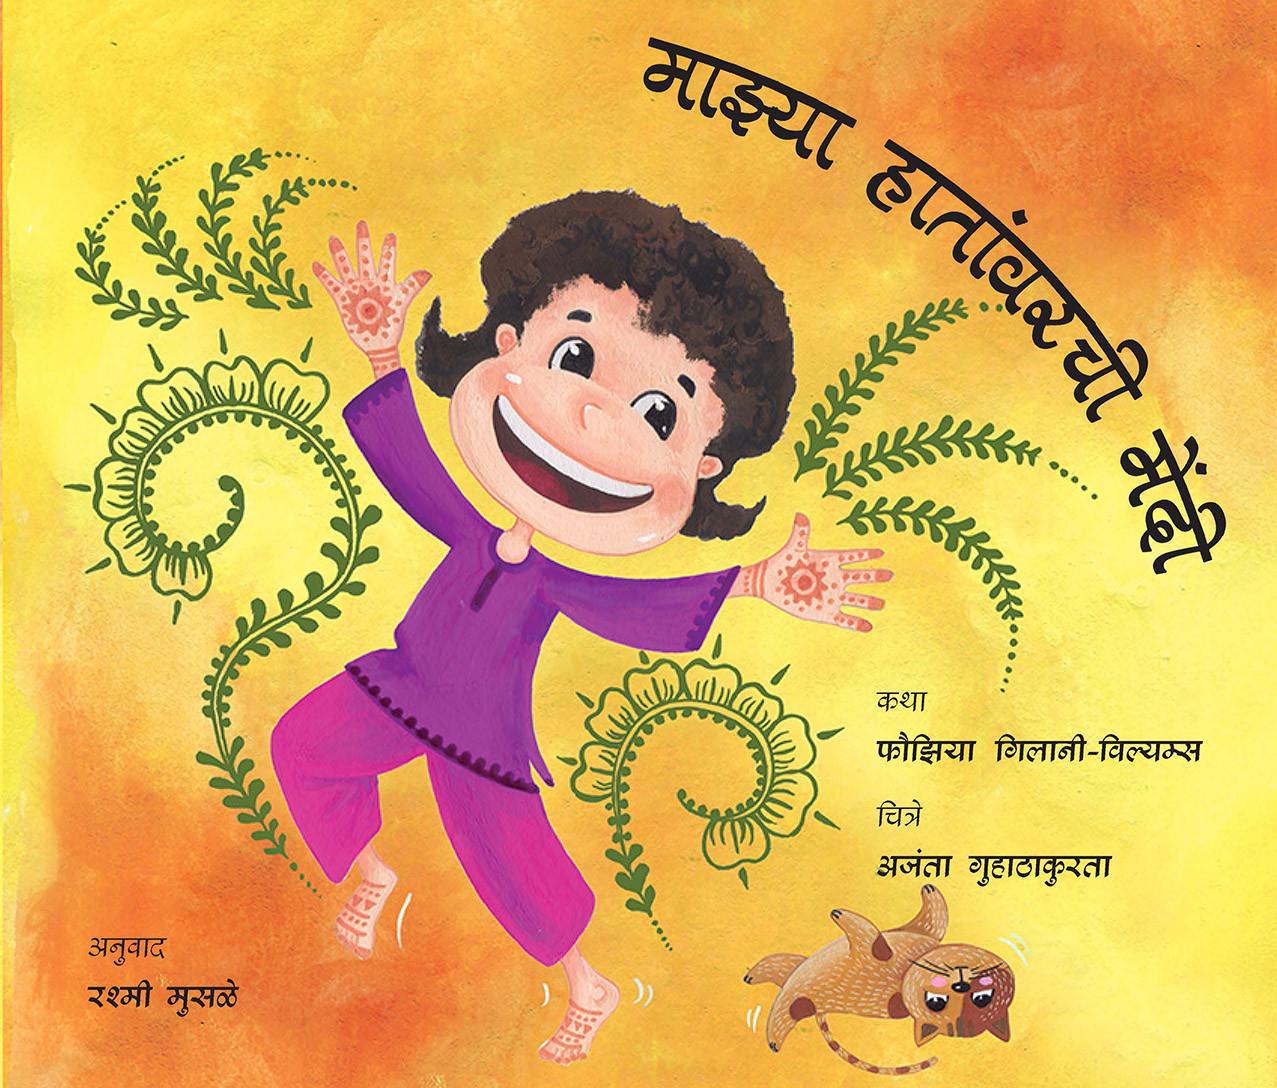 Henna on my Hands/Maajhya Haathanvarchi Mendi (Marathi)